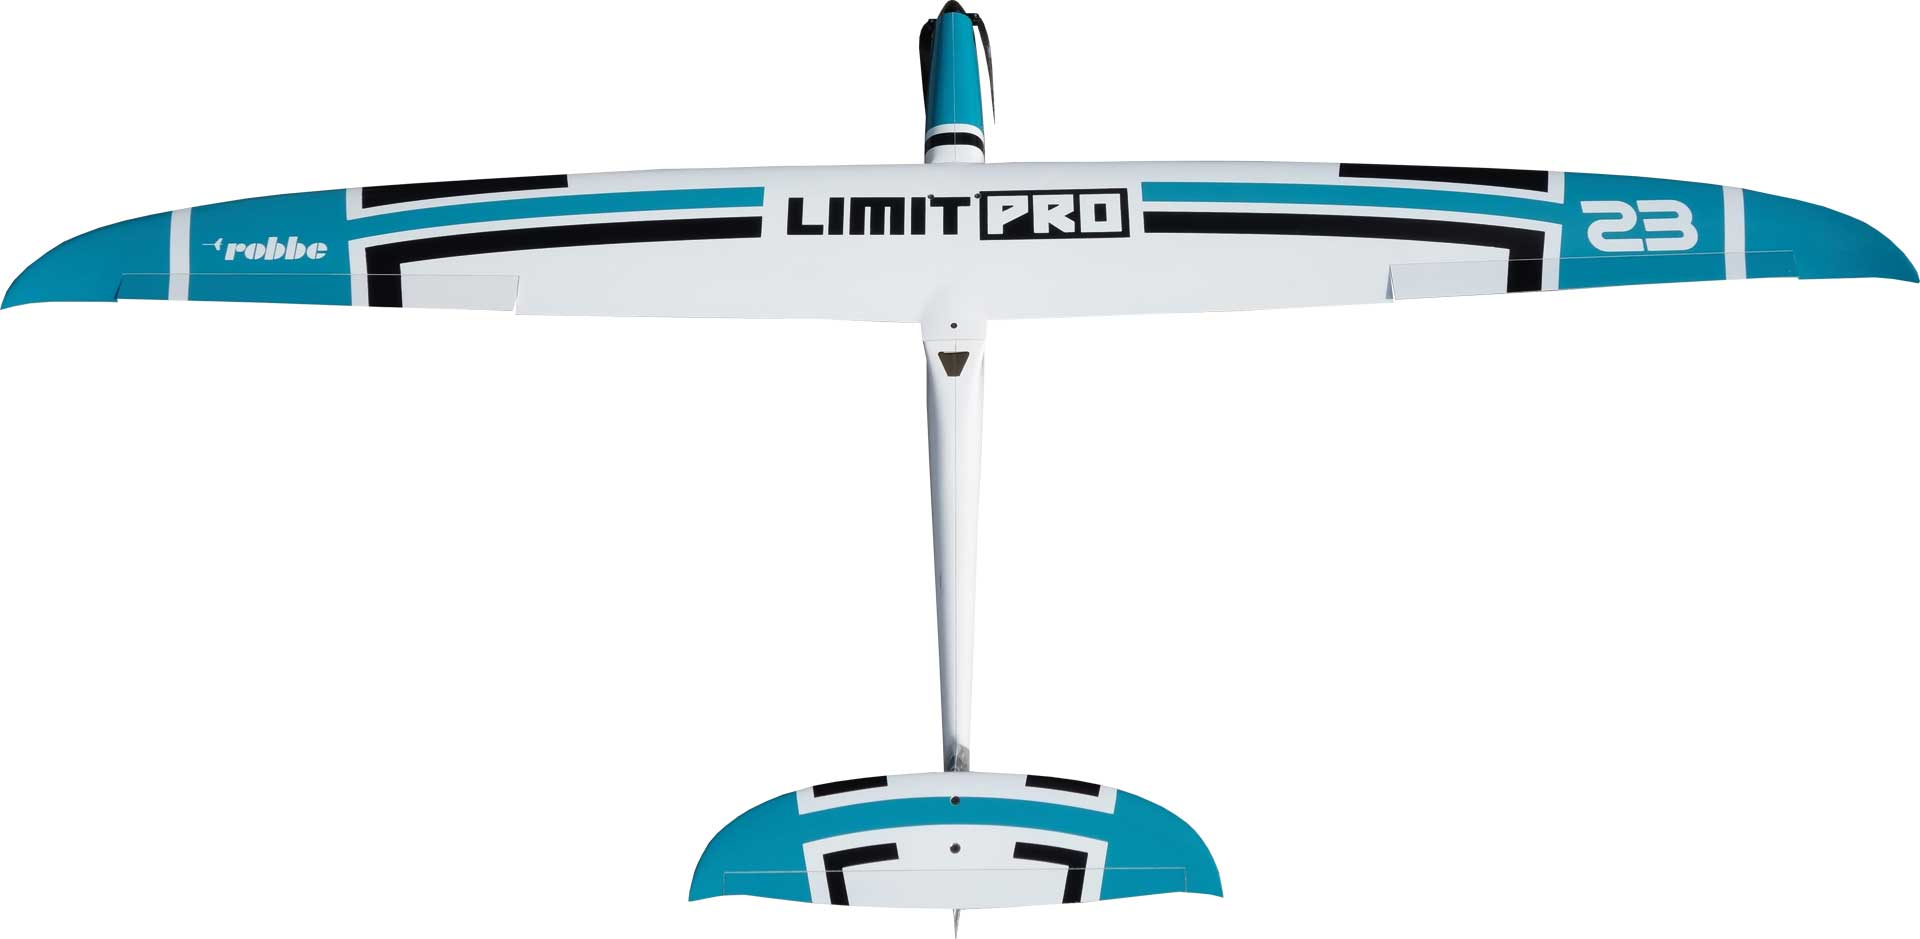 Robbe Modellsport Limit Pro ARF PETROL Voll-GfK/CfK